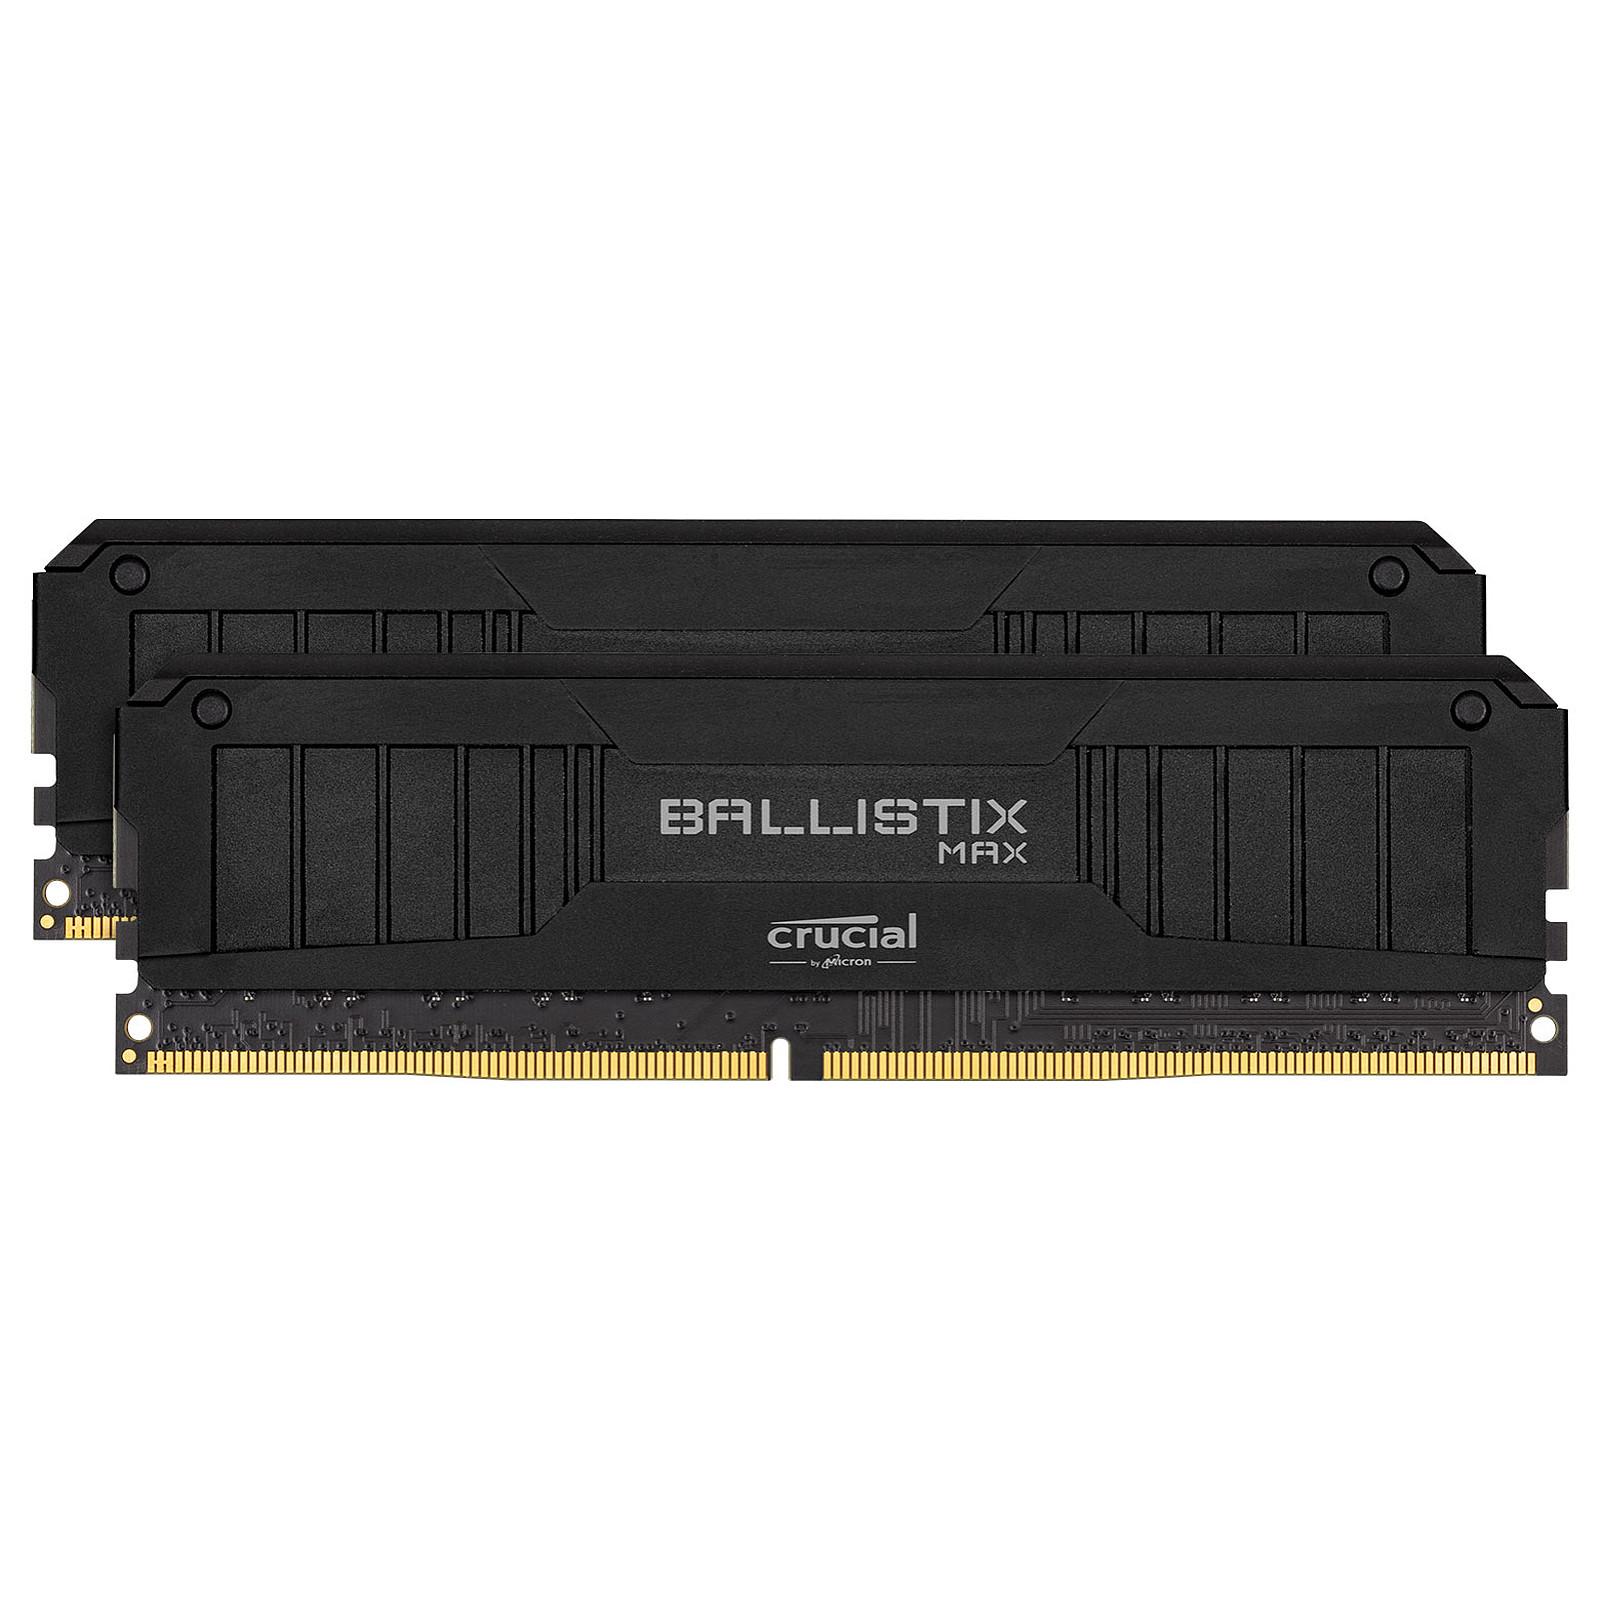 Ballistix Max 32 Go (2 x 16 Go) DDR4 4400 MHz CL19